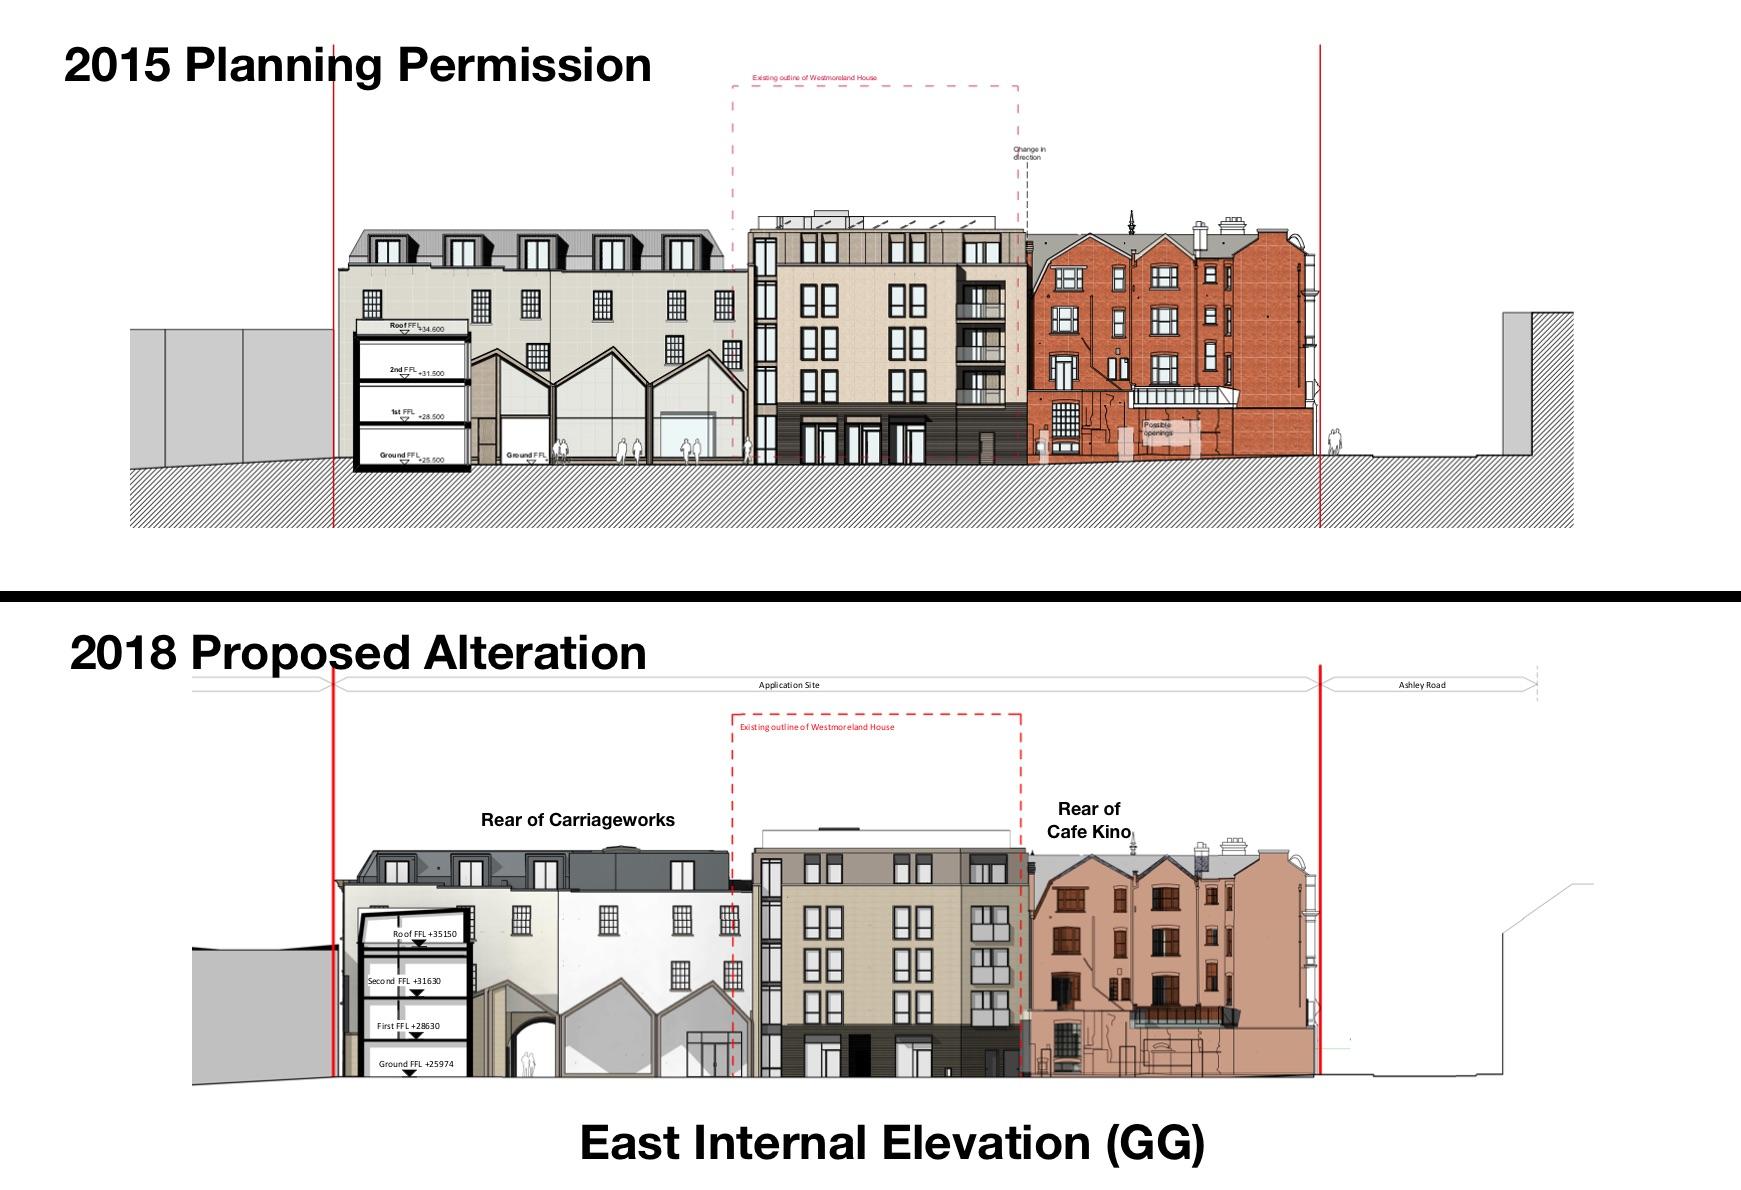 GG east internal comparison.jpg